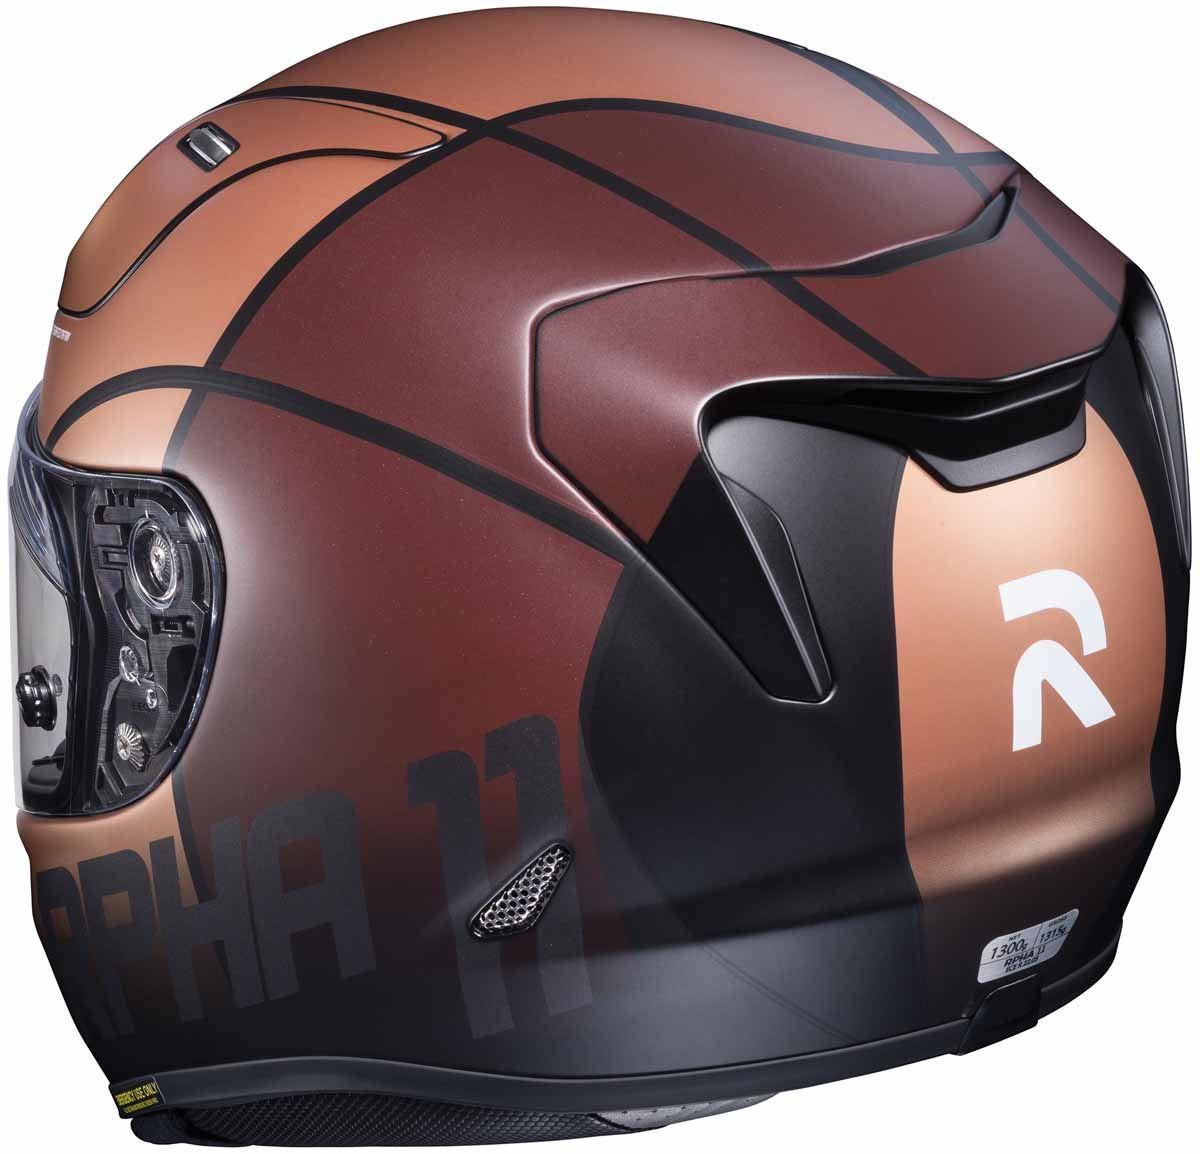 HJC-RPHA-11-Pro-Quintain-Helmet-Full-Face-DD-Ring-Fastening-DOT-ECE-XS-2XL thumbnail 4